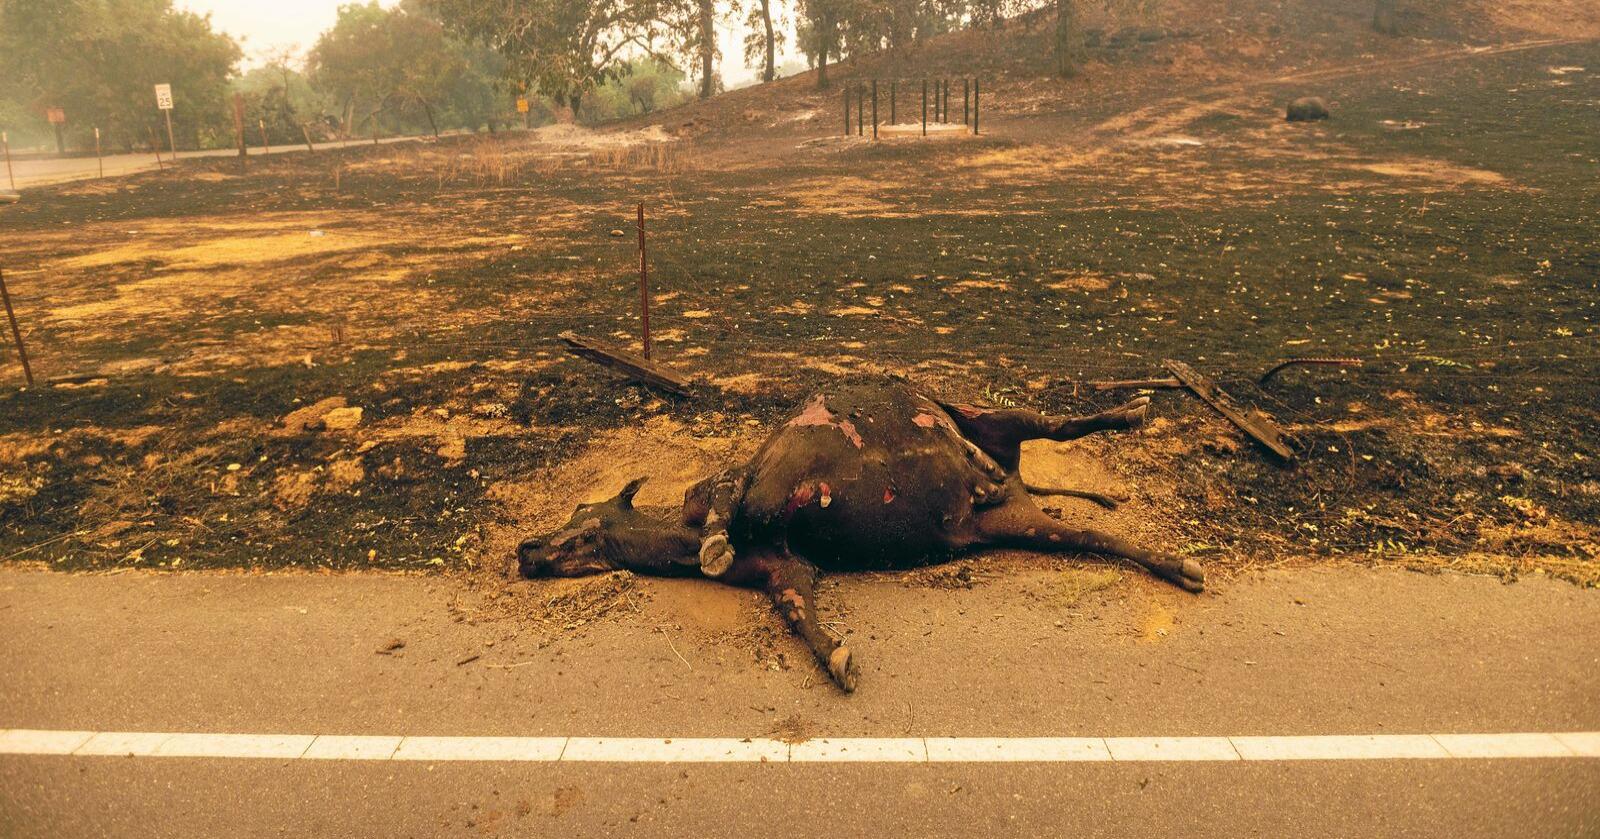 For fjerde år på rad herjer skogbrannene i California. Foto: AP/Noah Berger/NTB Scanpix